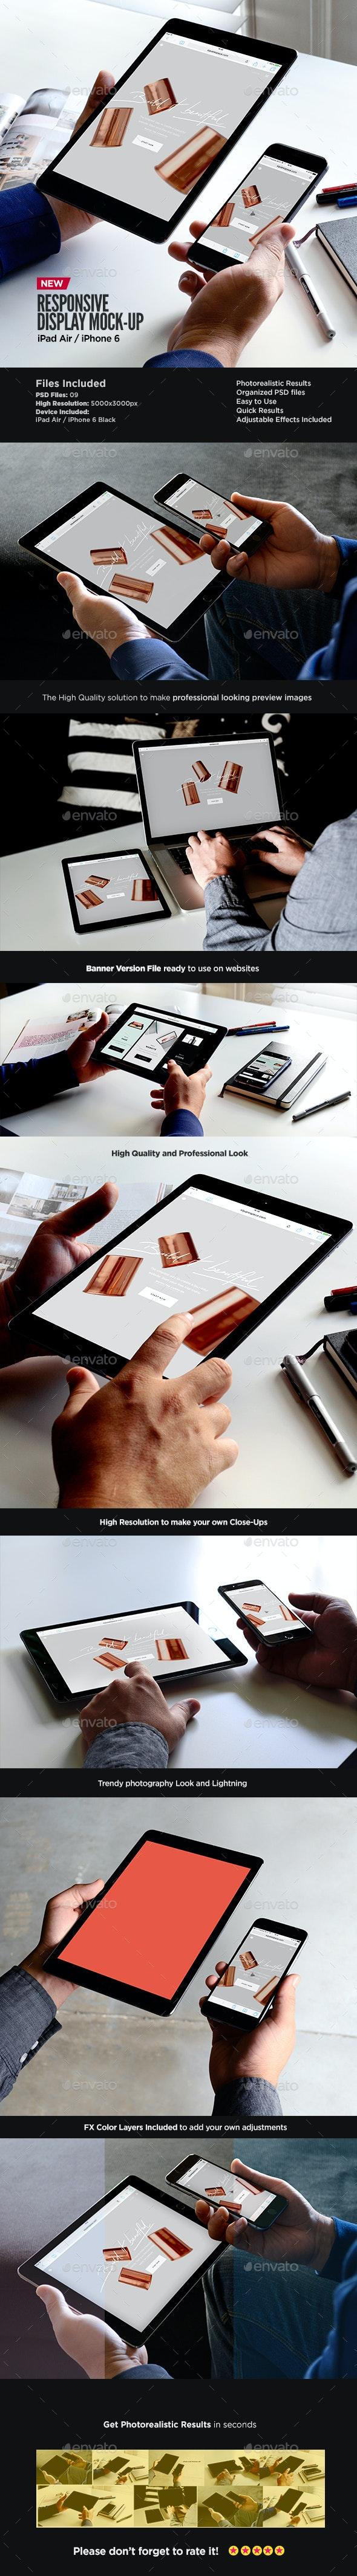 iPad Air iPhone Responsive Display Web App Mock-Up - Multiple Displays